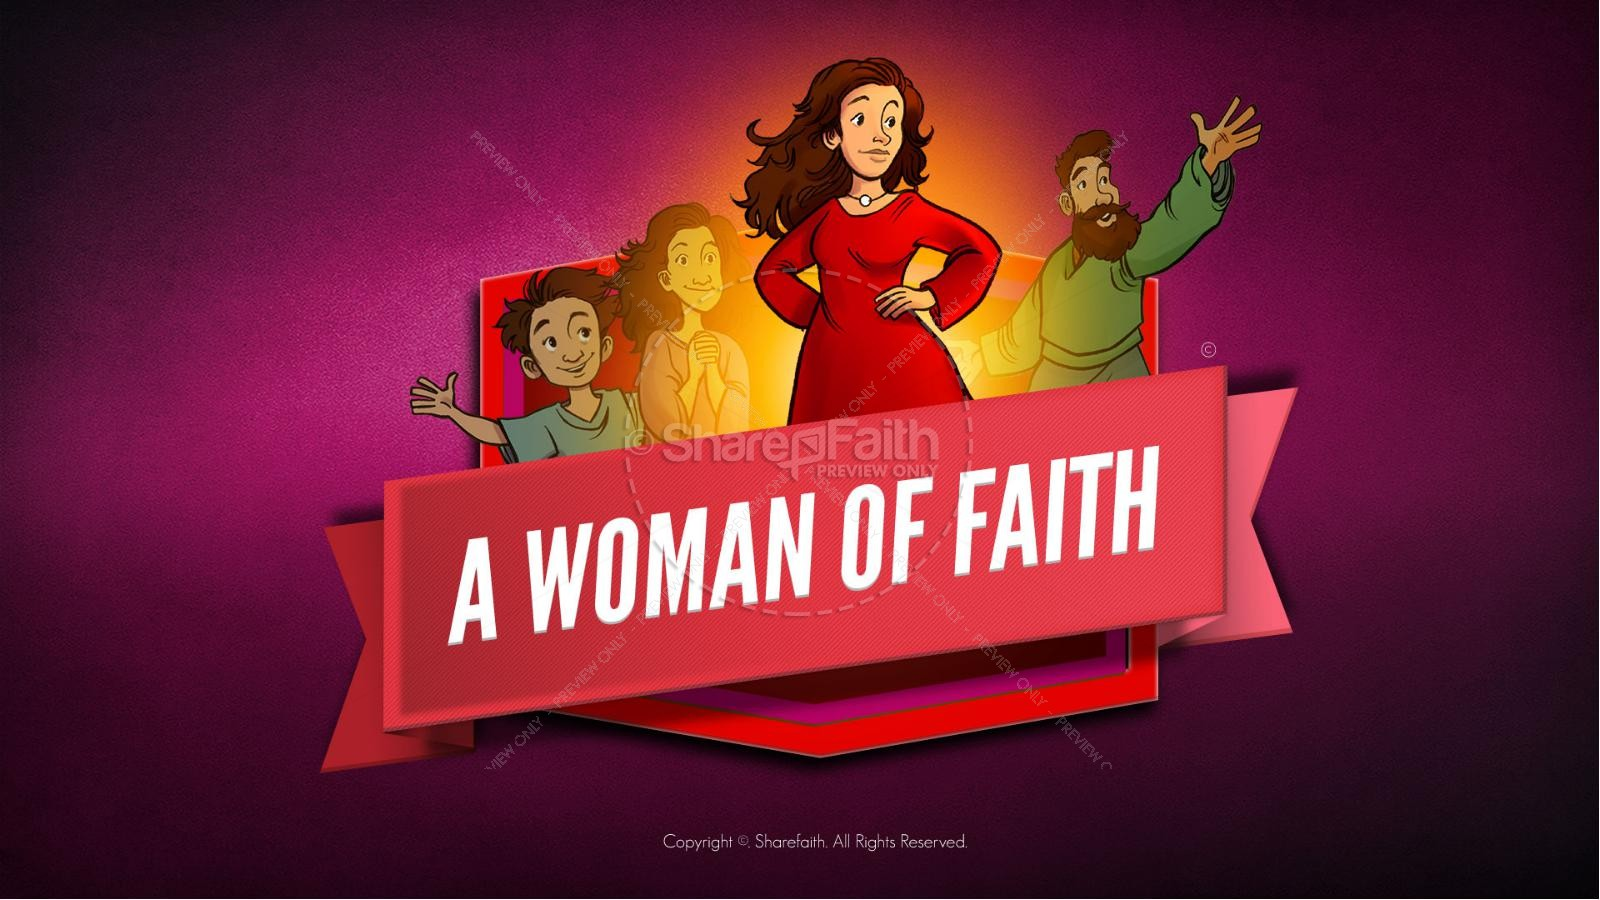 Proverbs 31 A Woman of Faith Kids Bible Story | slide 1